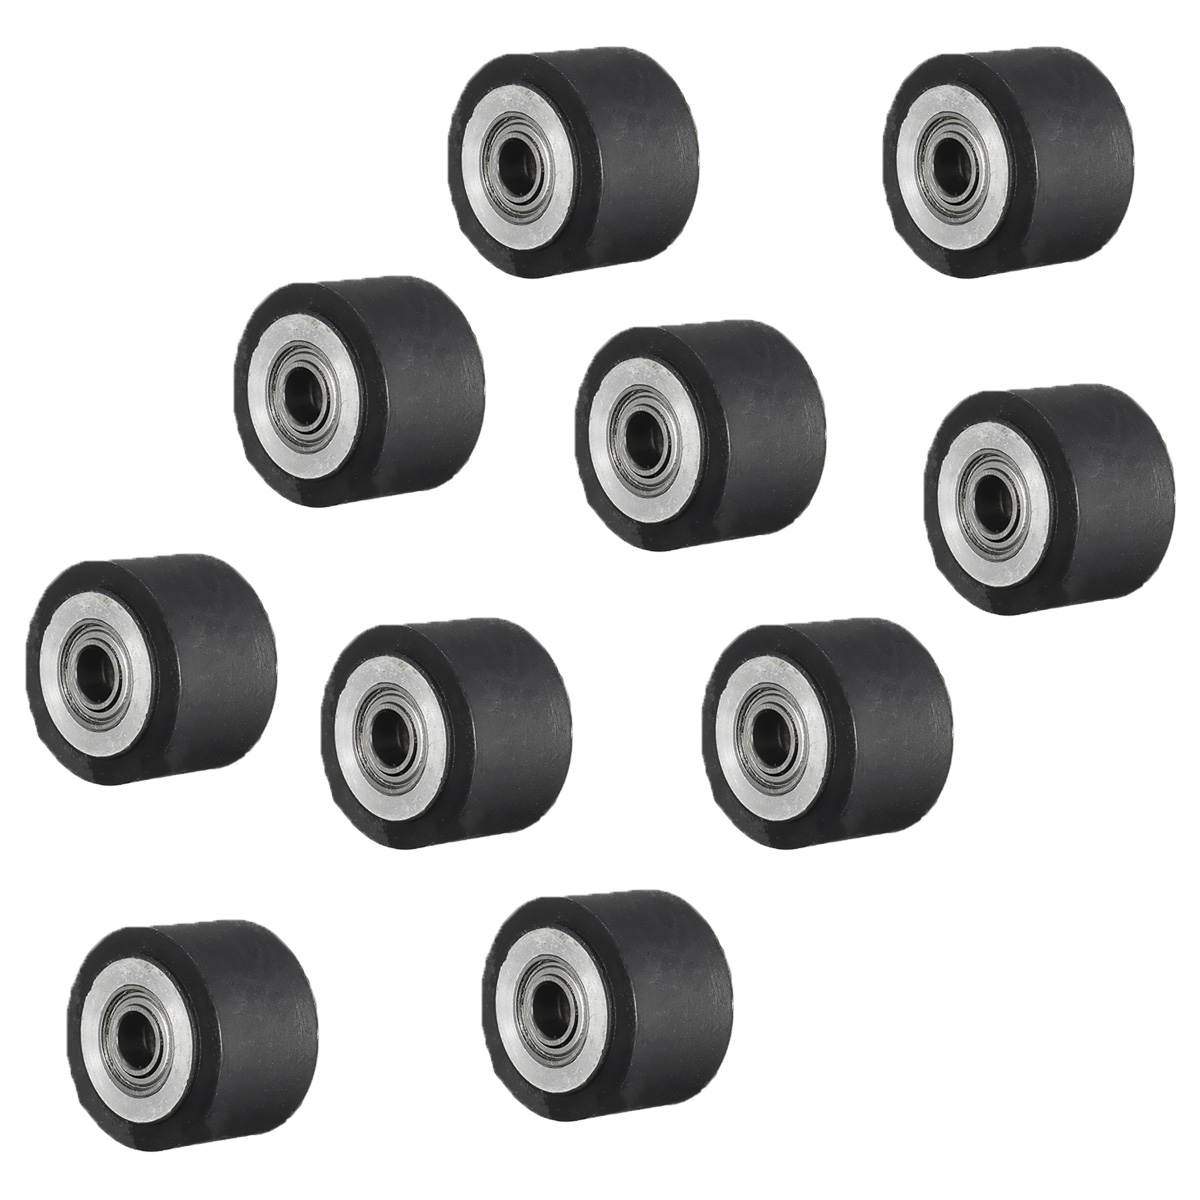 5Pcs/10Pcs Pinch Roller Wheel Machinery Parts For Roland Vinyl Cutting Plotter 4x11x16mm Wheel Bearing